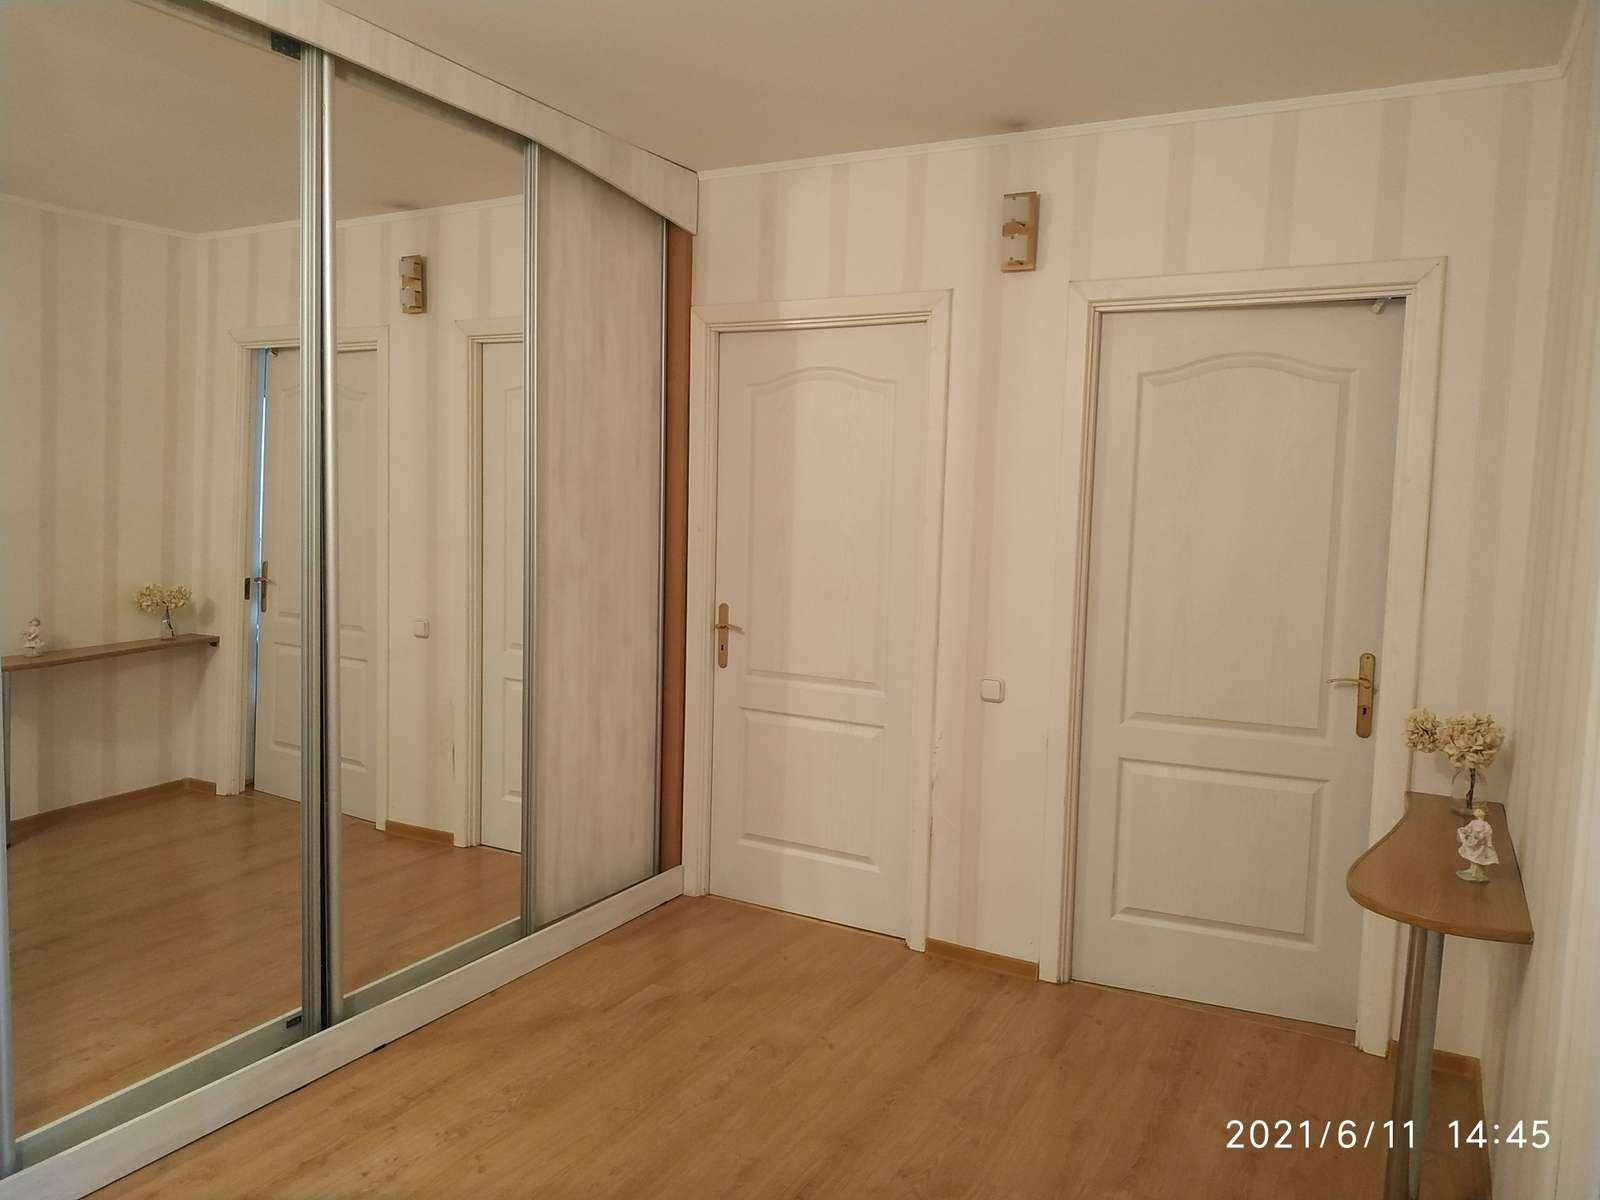 Продажа 3-комнатной квартиры, Самара, Осипенко улица,  дом 144